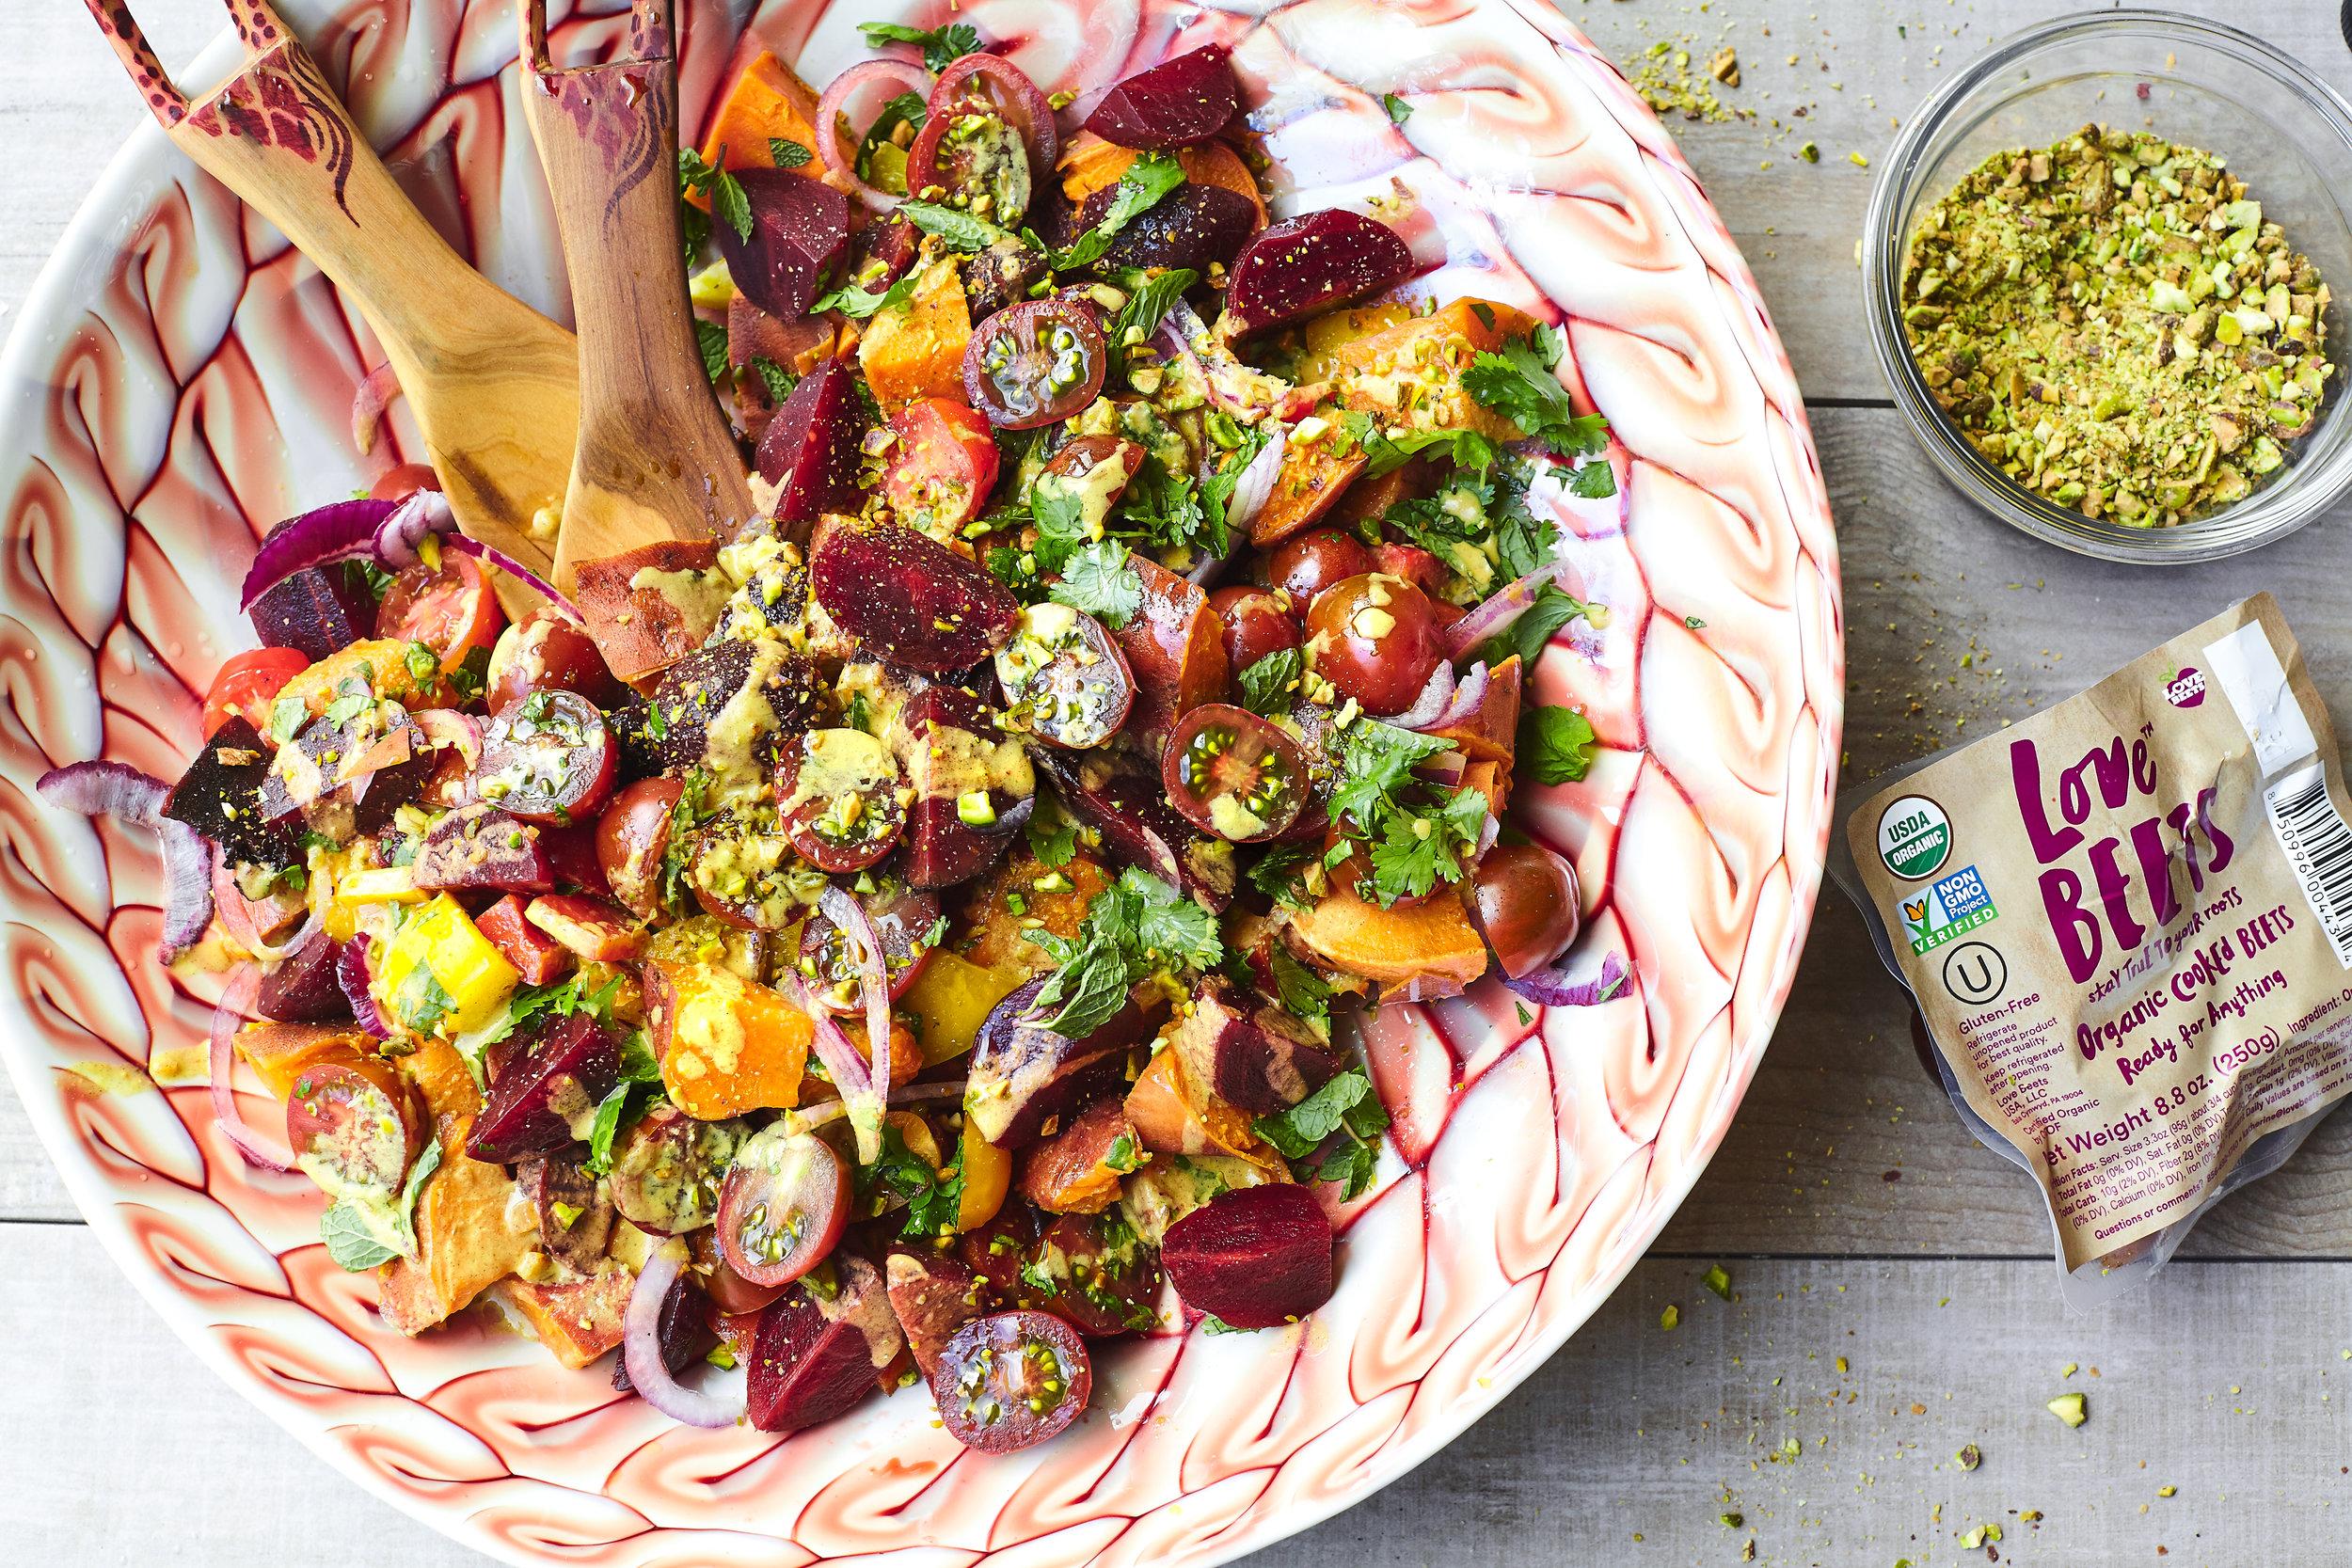 beet and sweet potato salad1.jpg